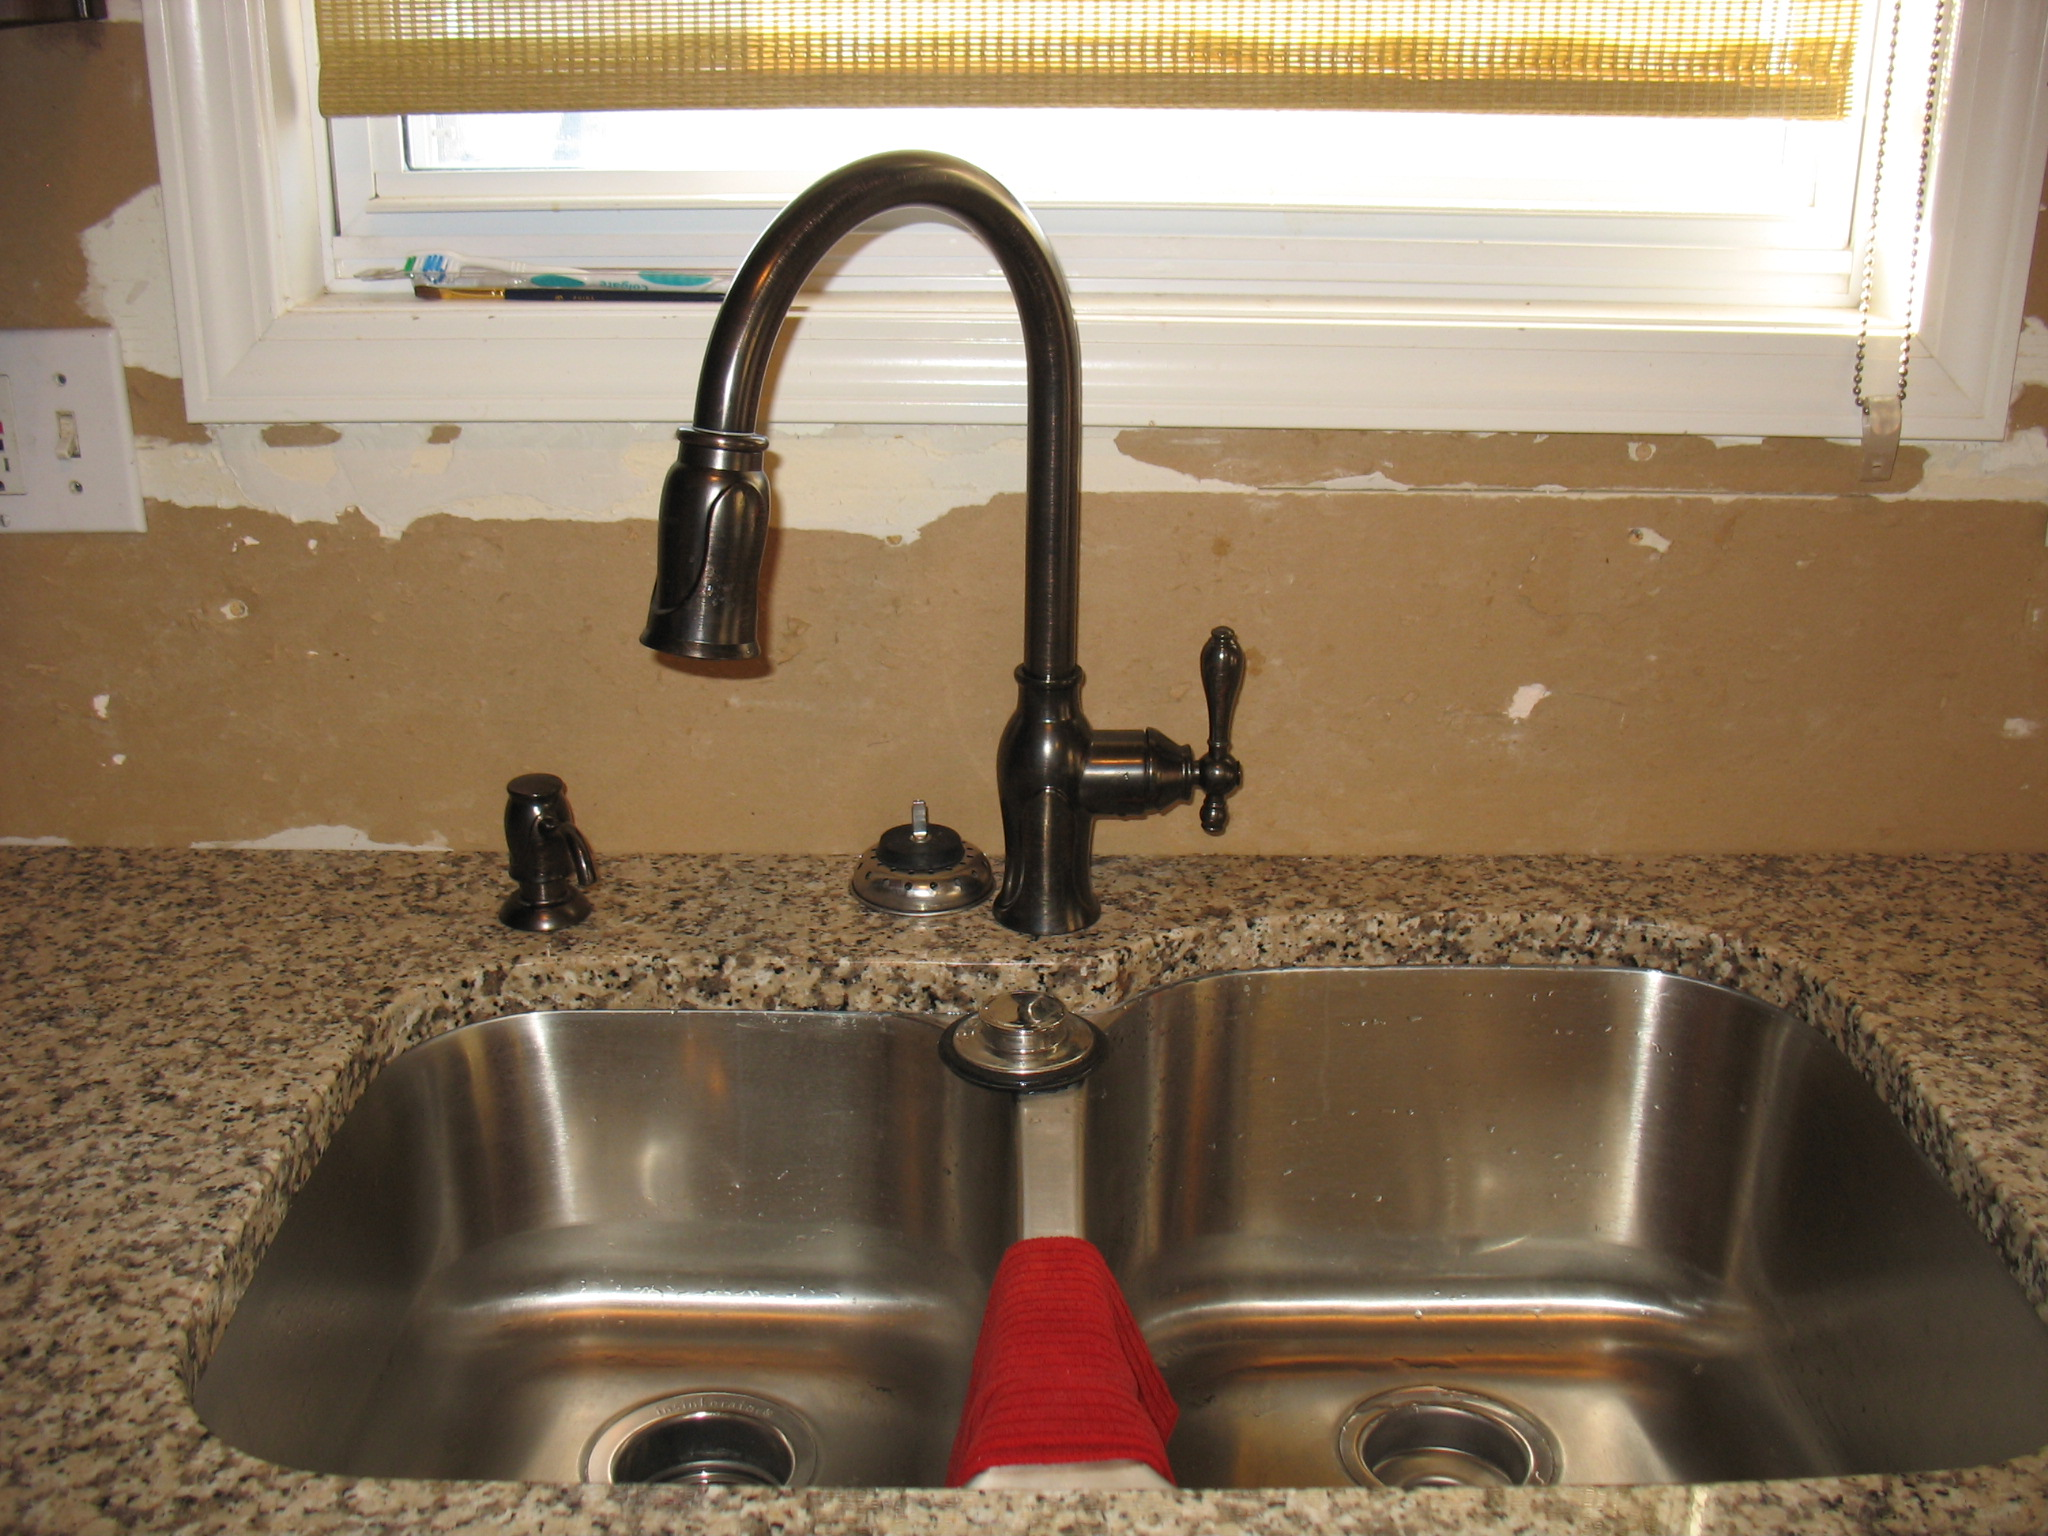 Pinterest the world s catalog of ideas - Bronze kitchen sinks ...